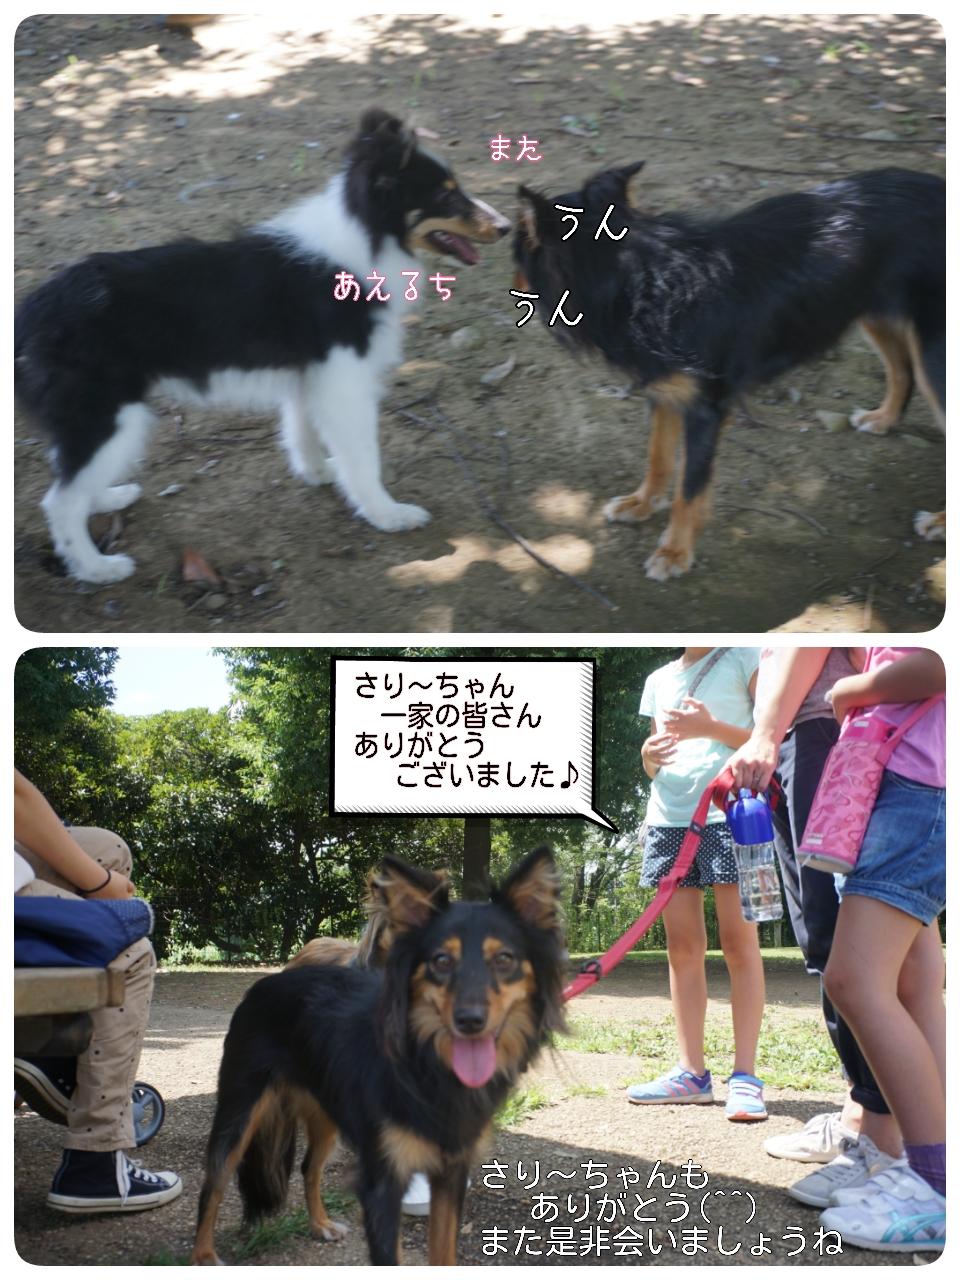 2015-08-09-17-12-36_deco.jpg